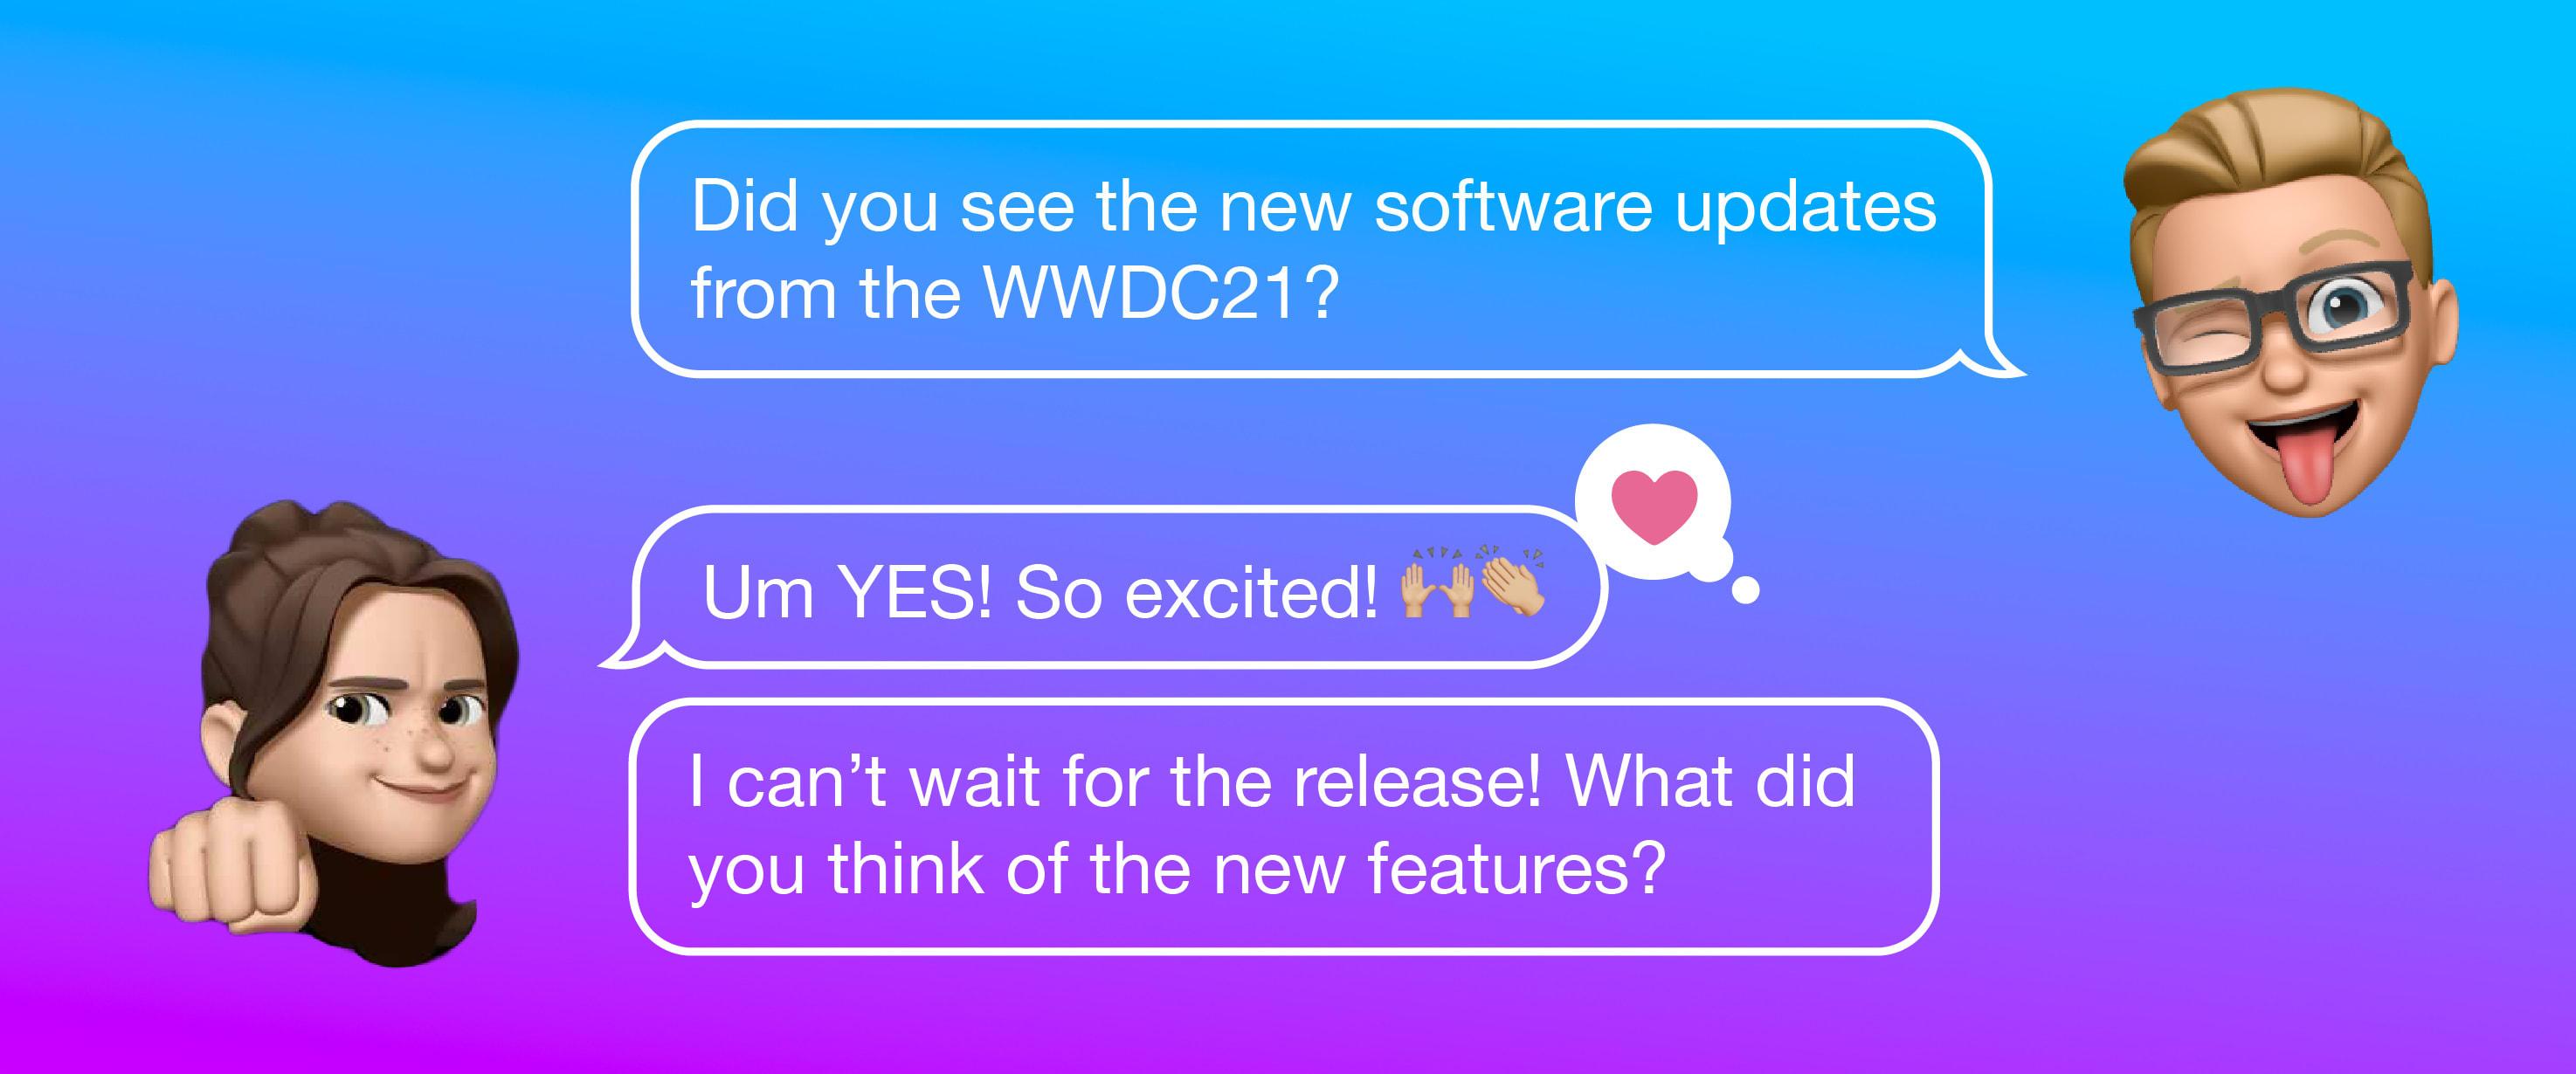 Apple Updates Have the Tele Team Buzzing